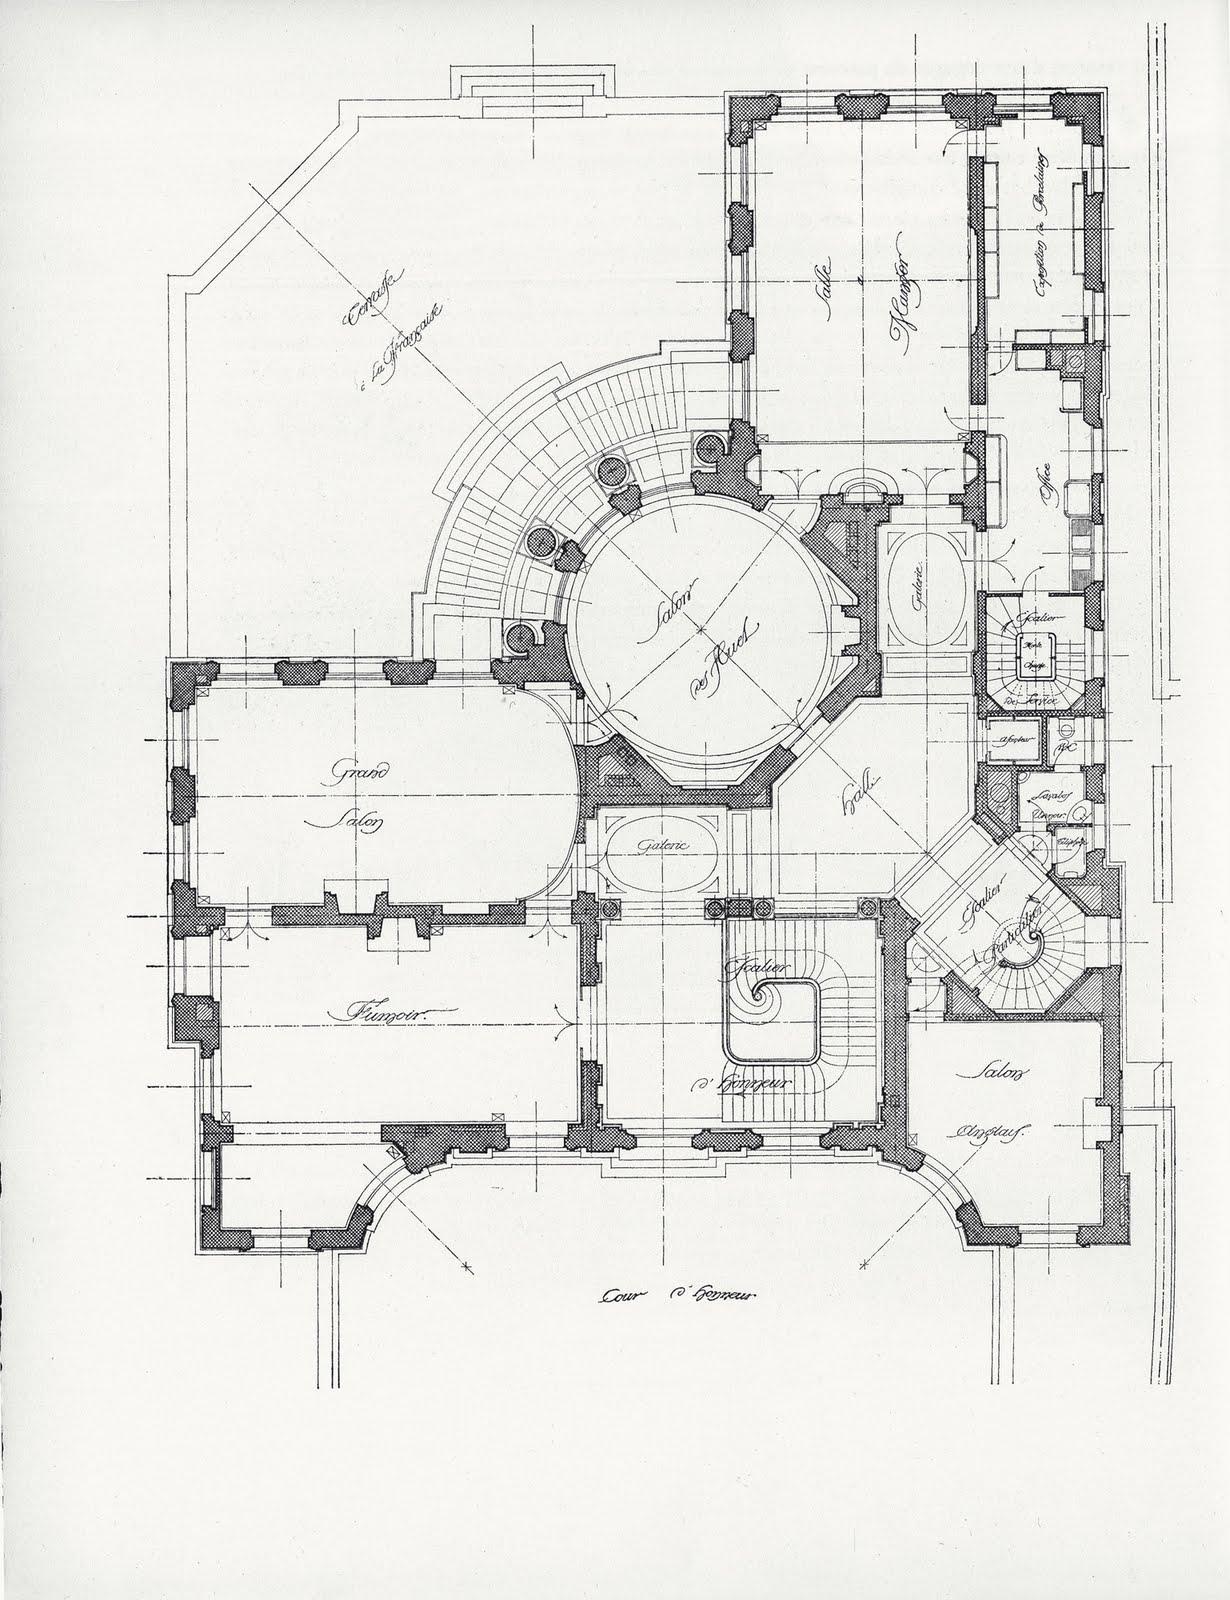 Mansion floor plans for Hotel design paris 8